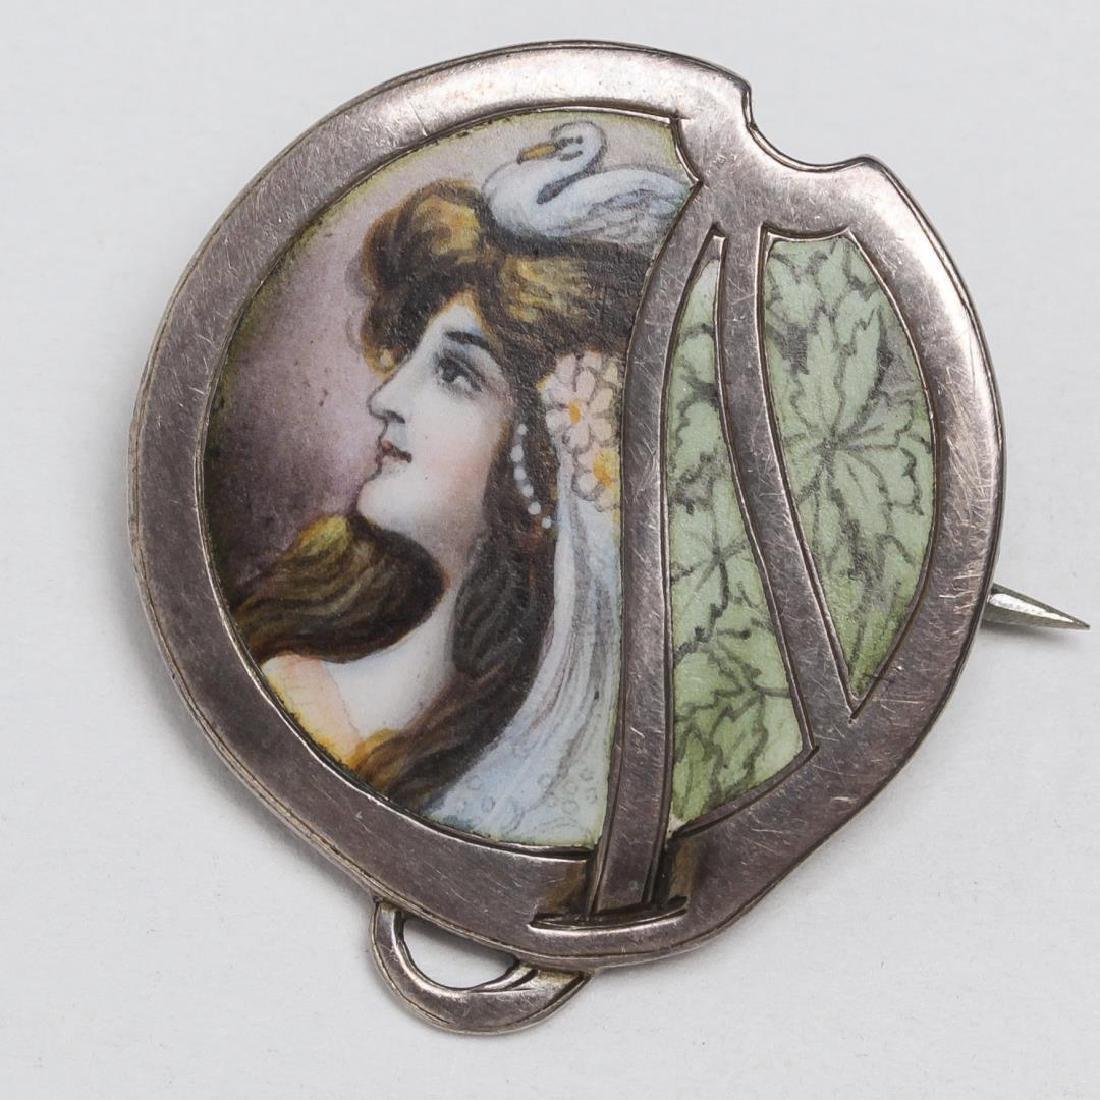 German Enameled Silver Portrait Brooch, Swan Maid